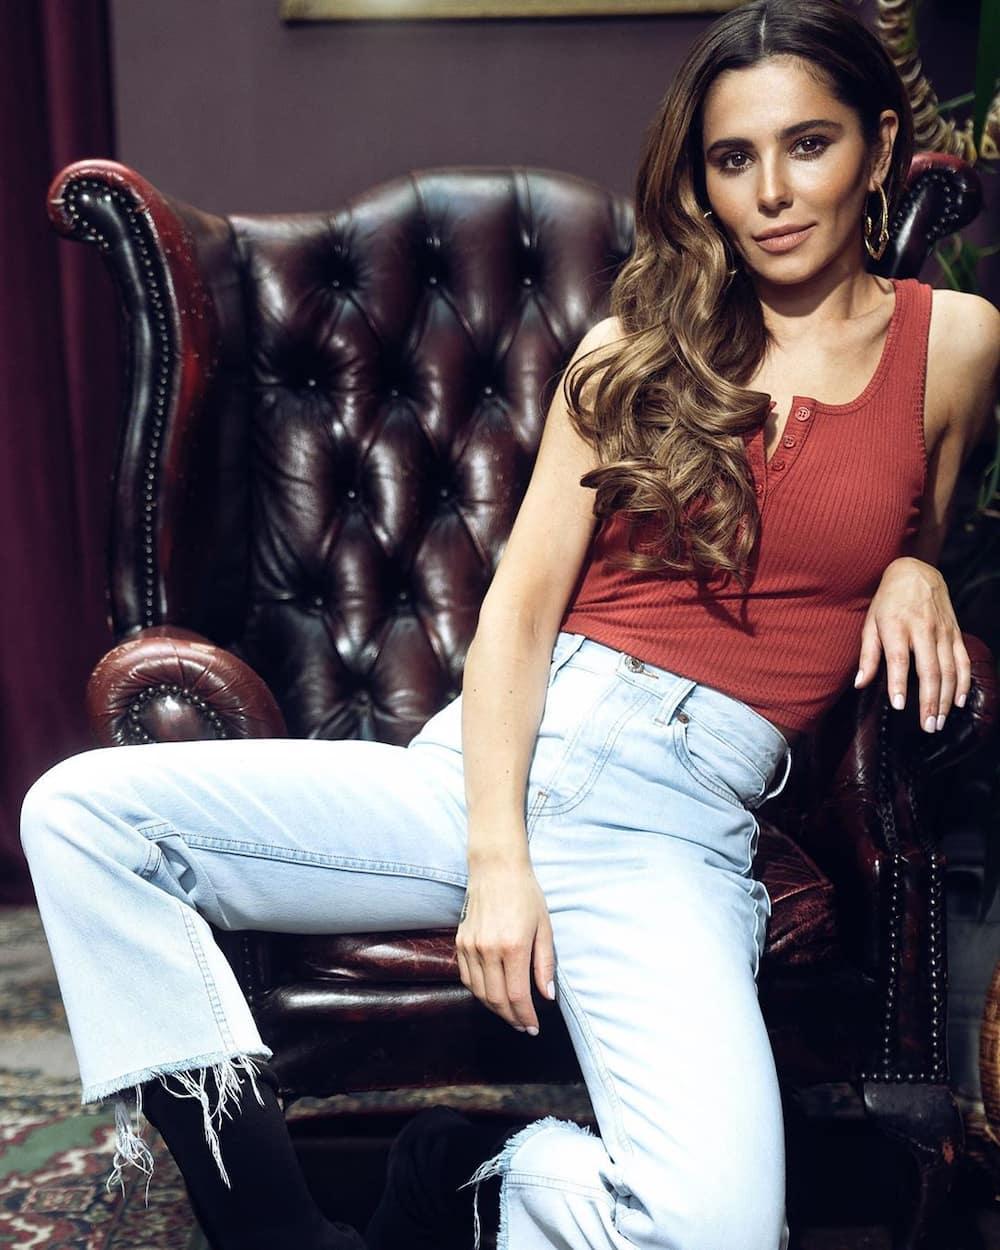 Cheryl Cole still married